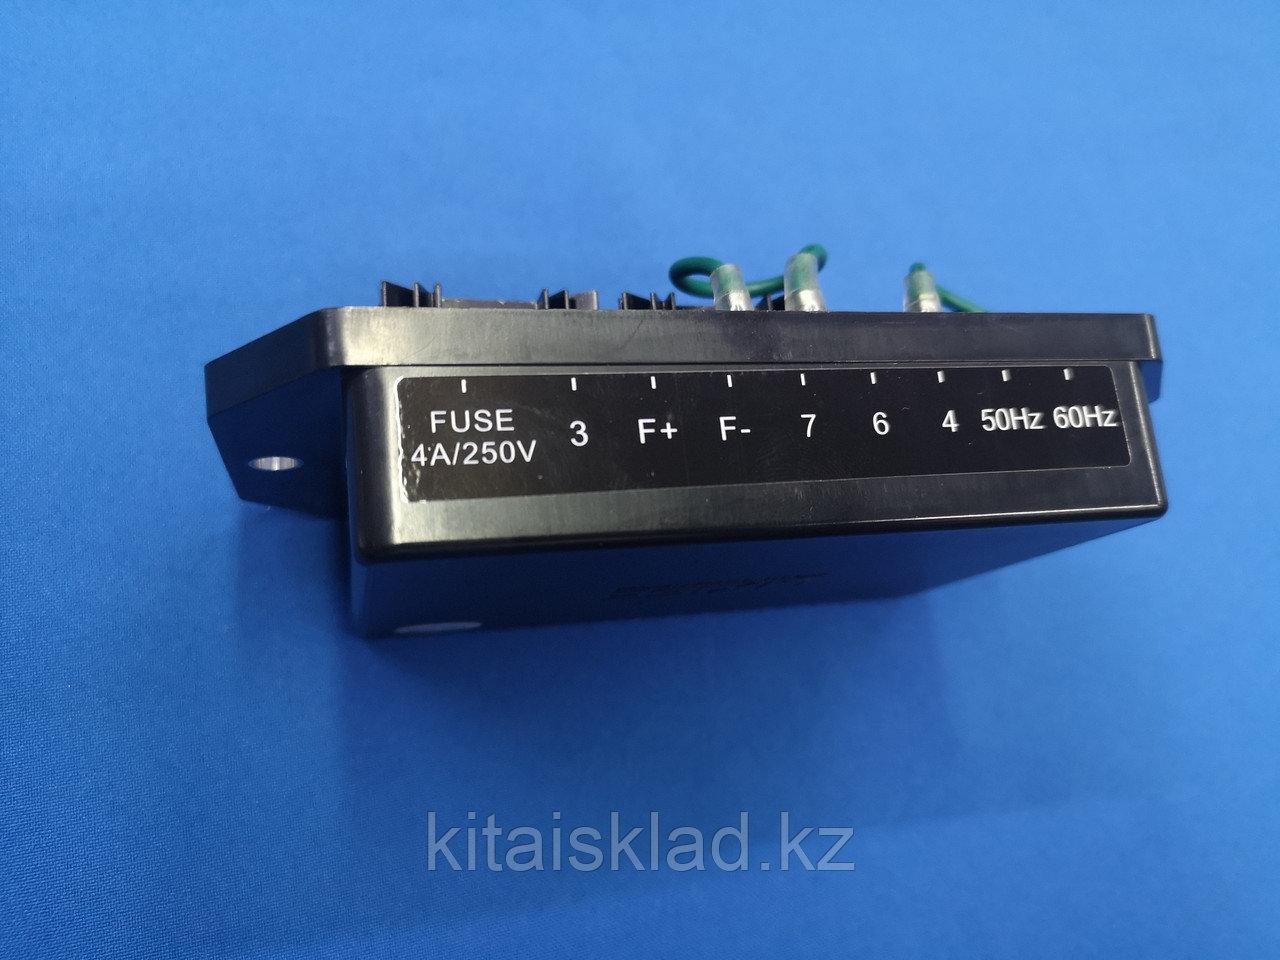 PX350 Регулятор напряжения генератора AVR KIPOR